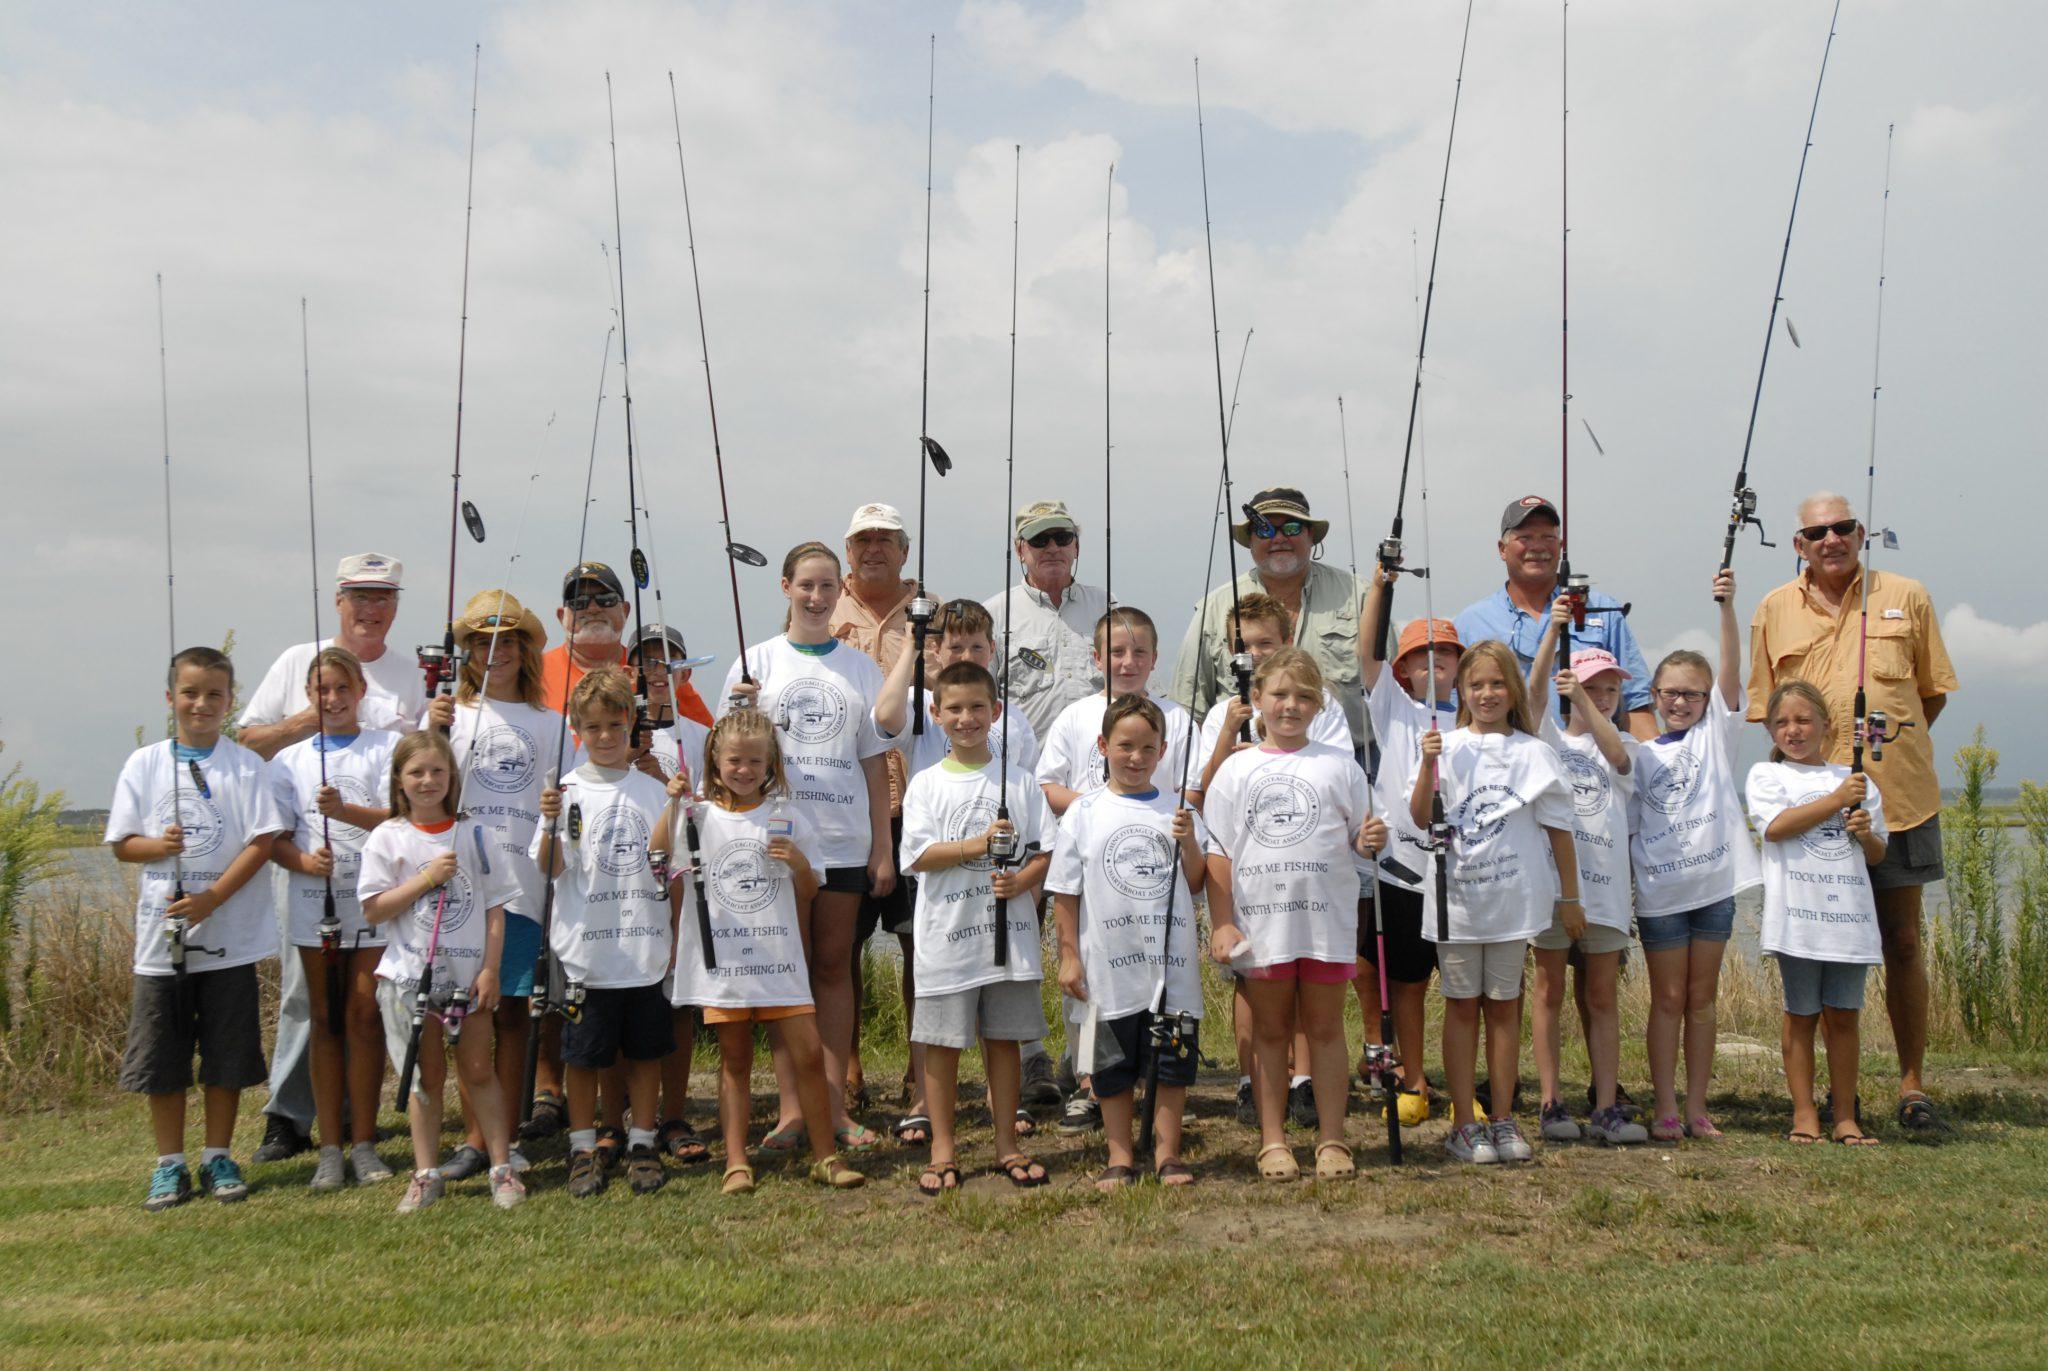 Atts https://www.chincoteaguechamber.com/wp-content/uploads/2018/02/kids-with-poles-1.jpg